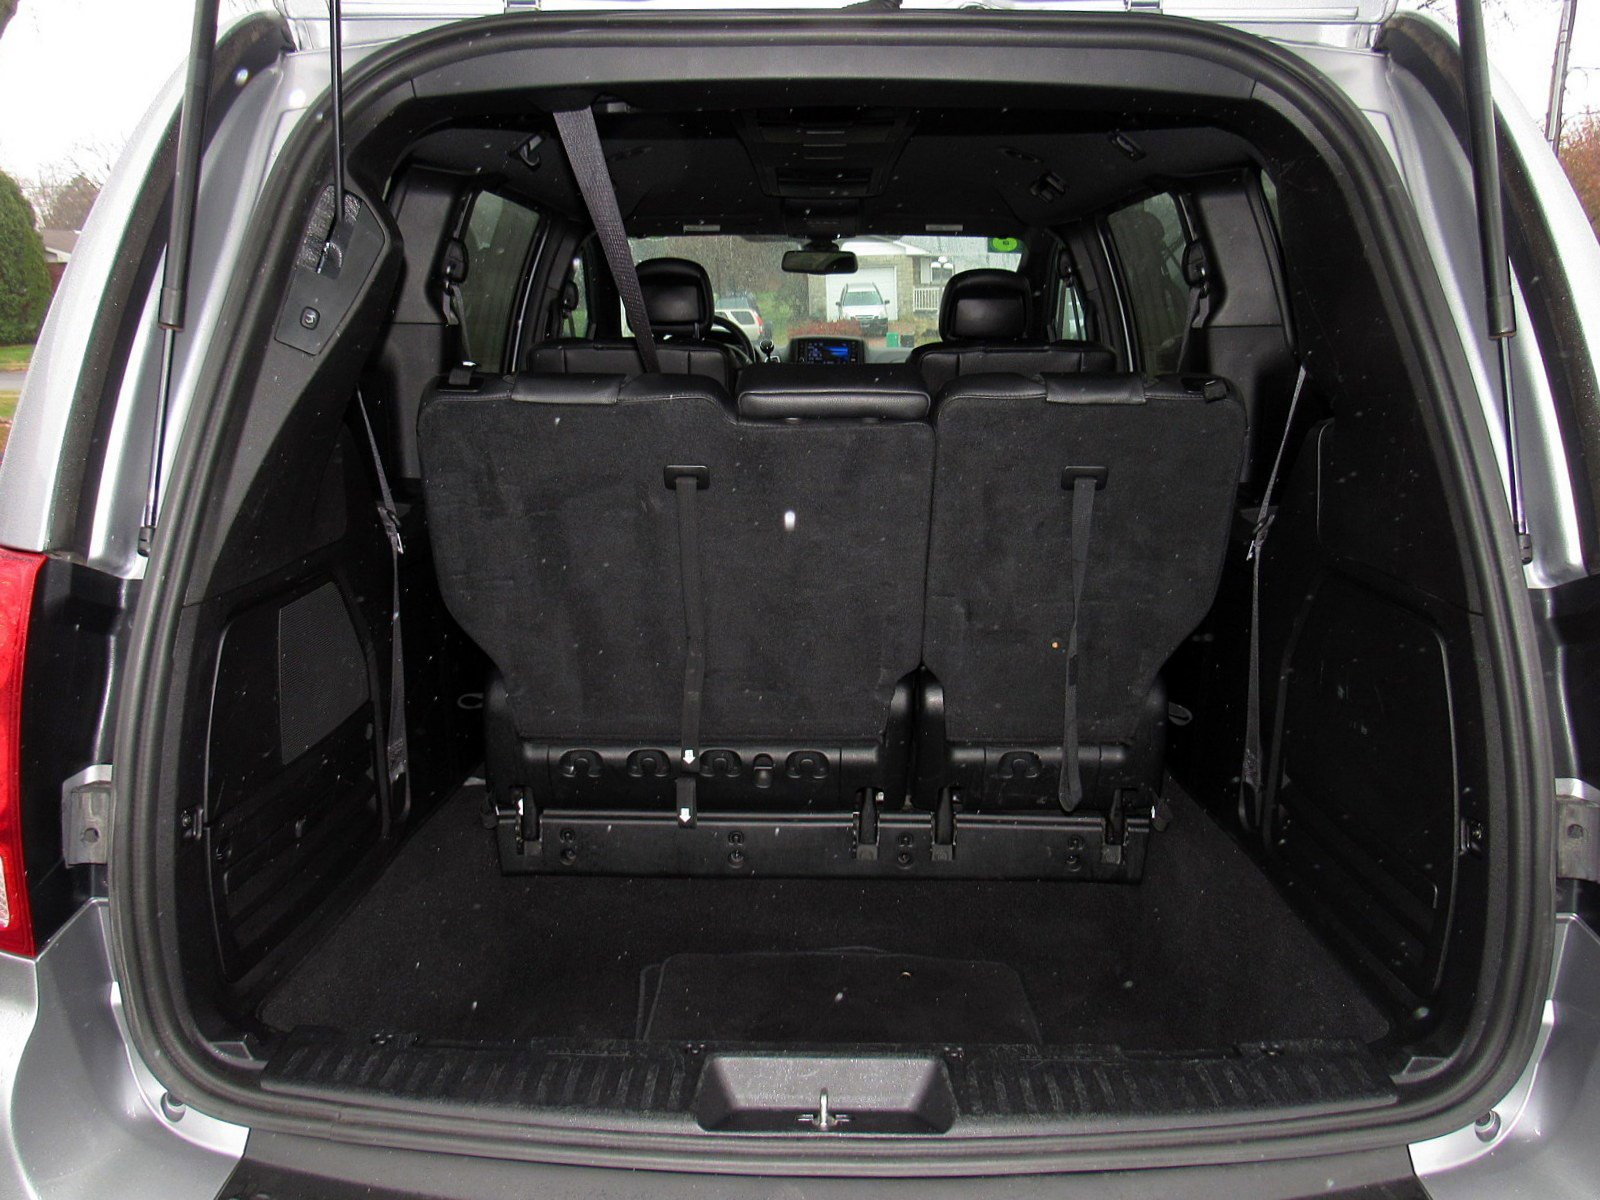 2018 Dodge Grand Caravan Mini-van, Passenger